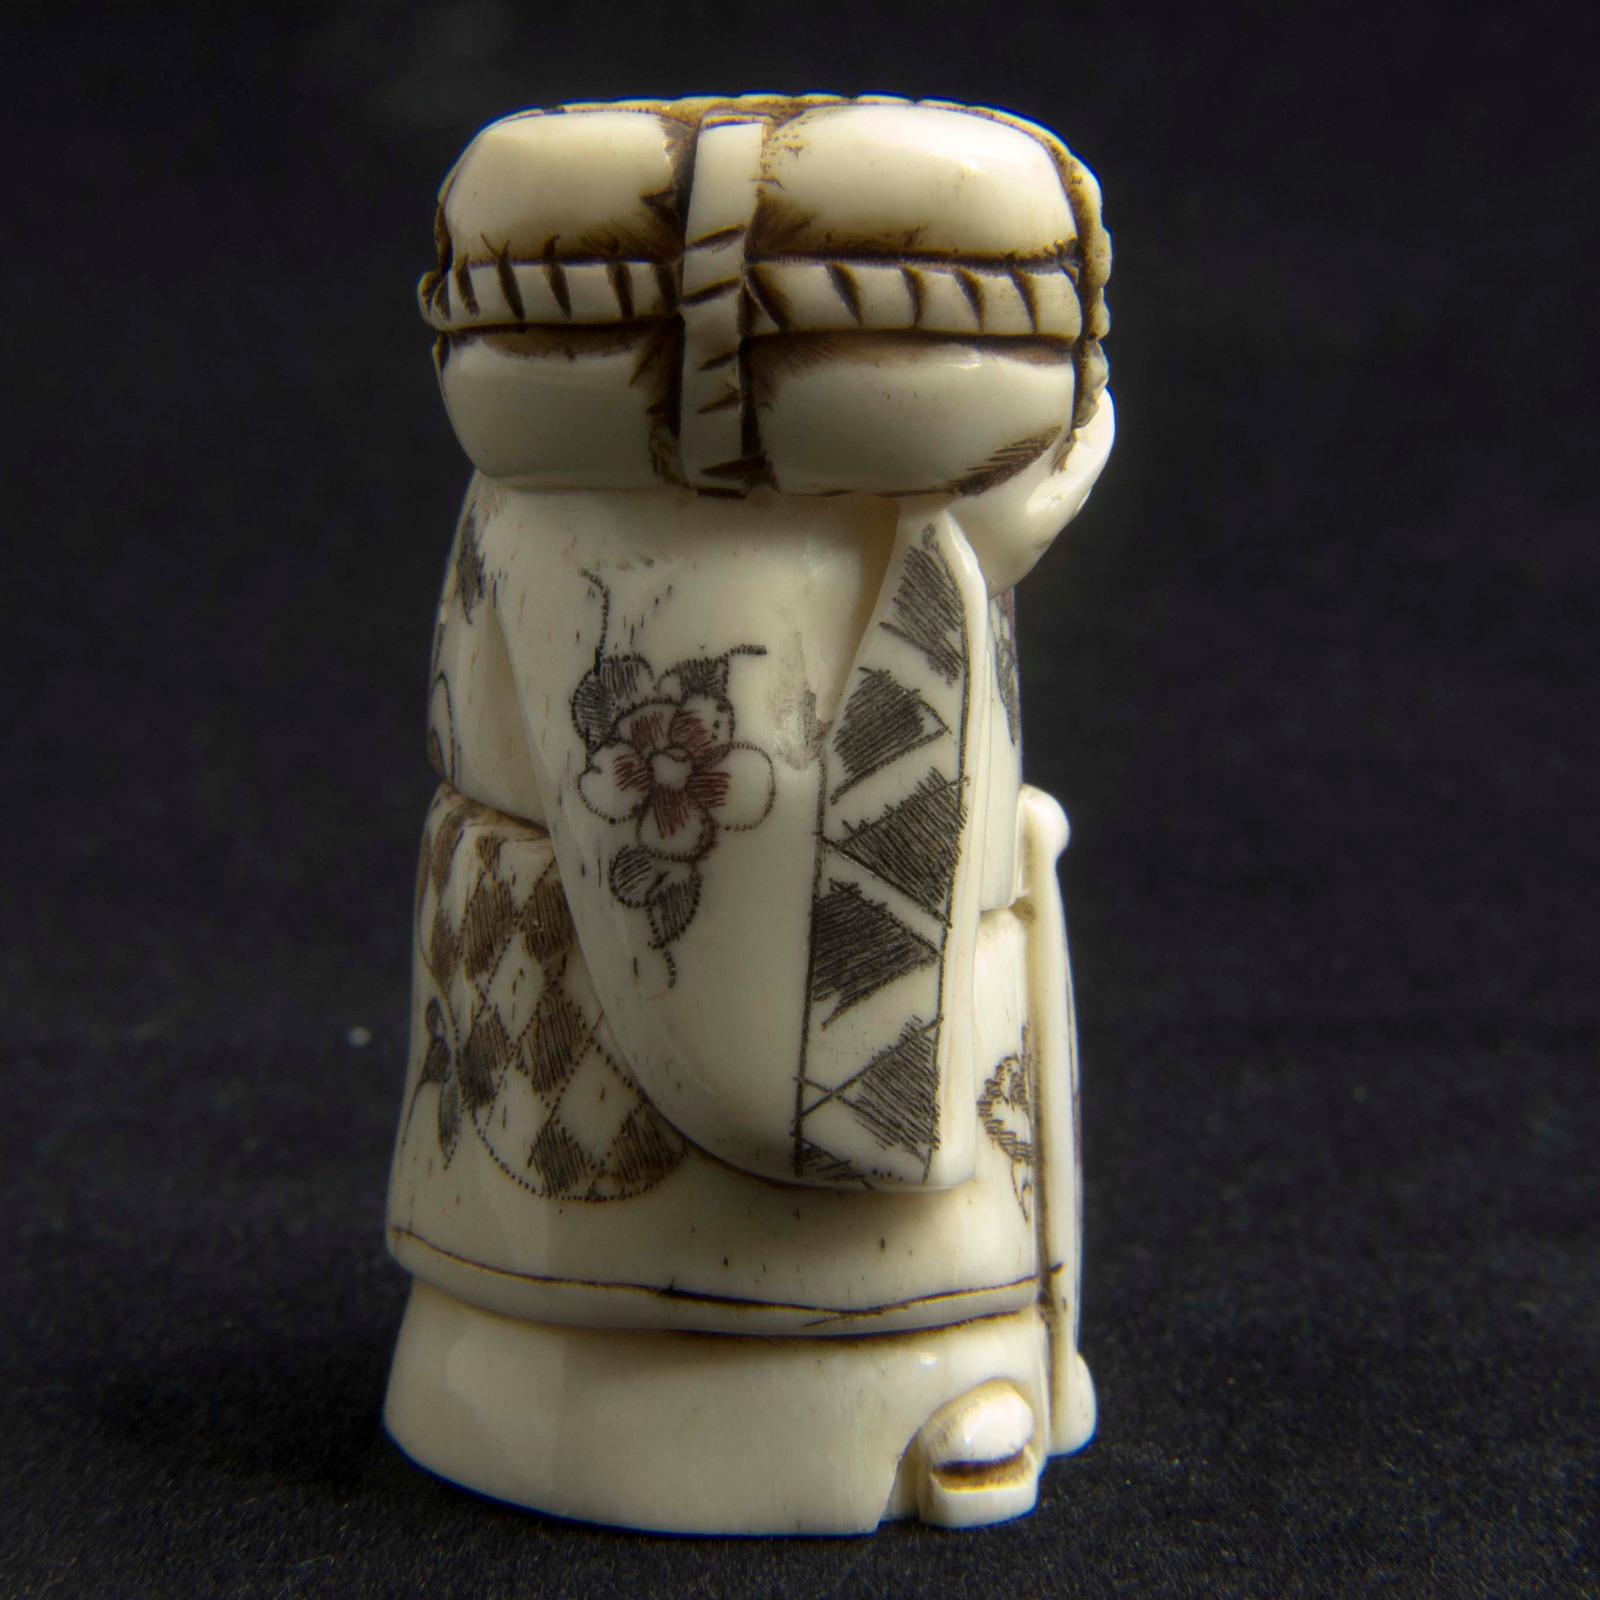 Japanese Carved Bone Netsuke 3208 La180384 Loveantiques Com